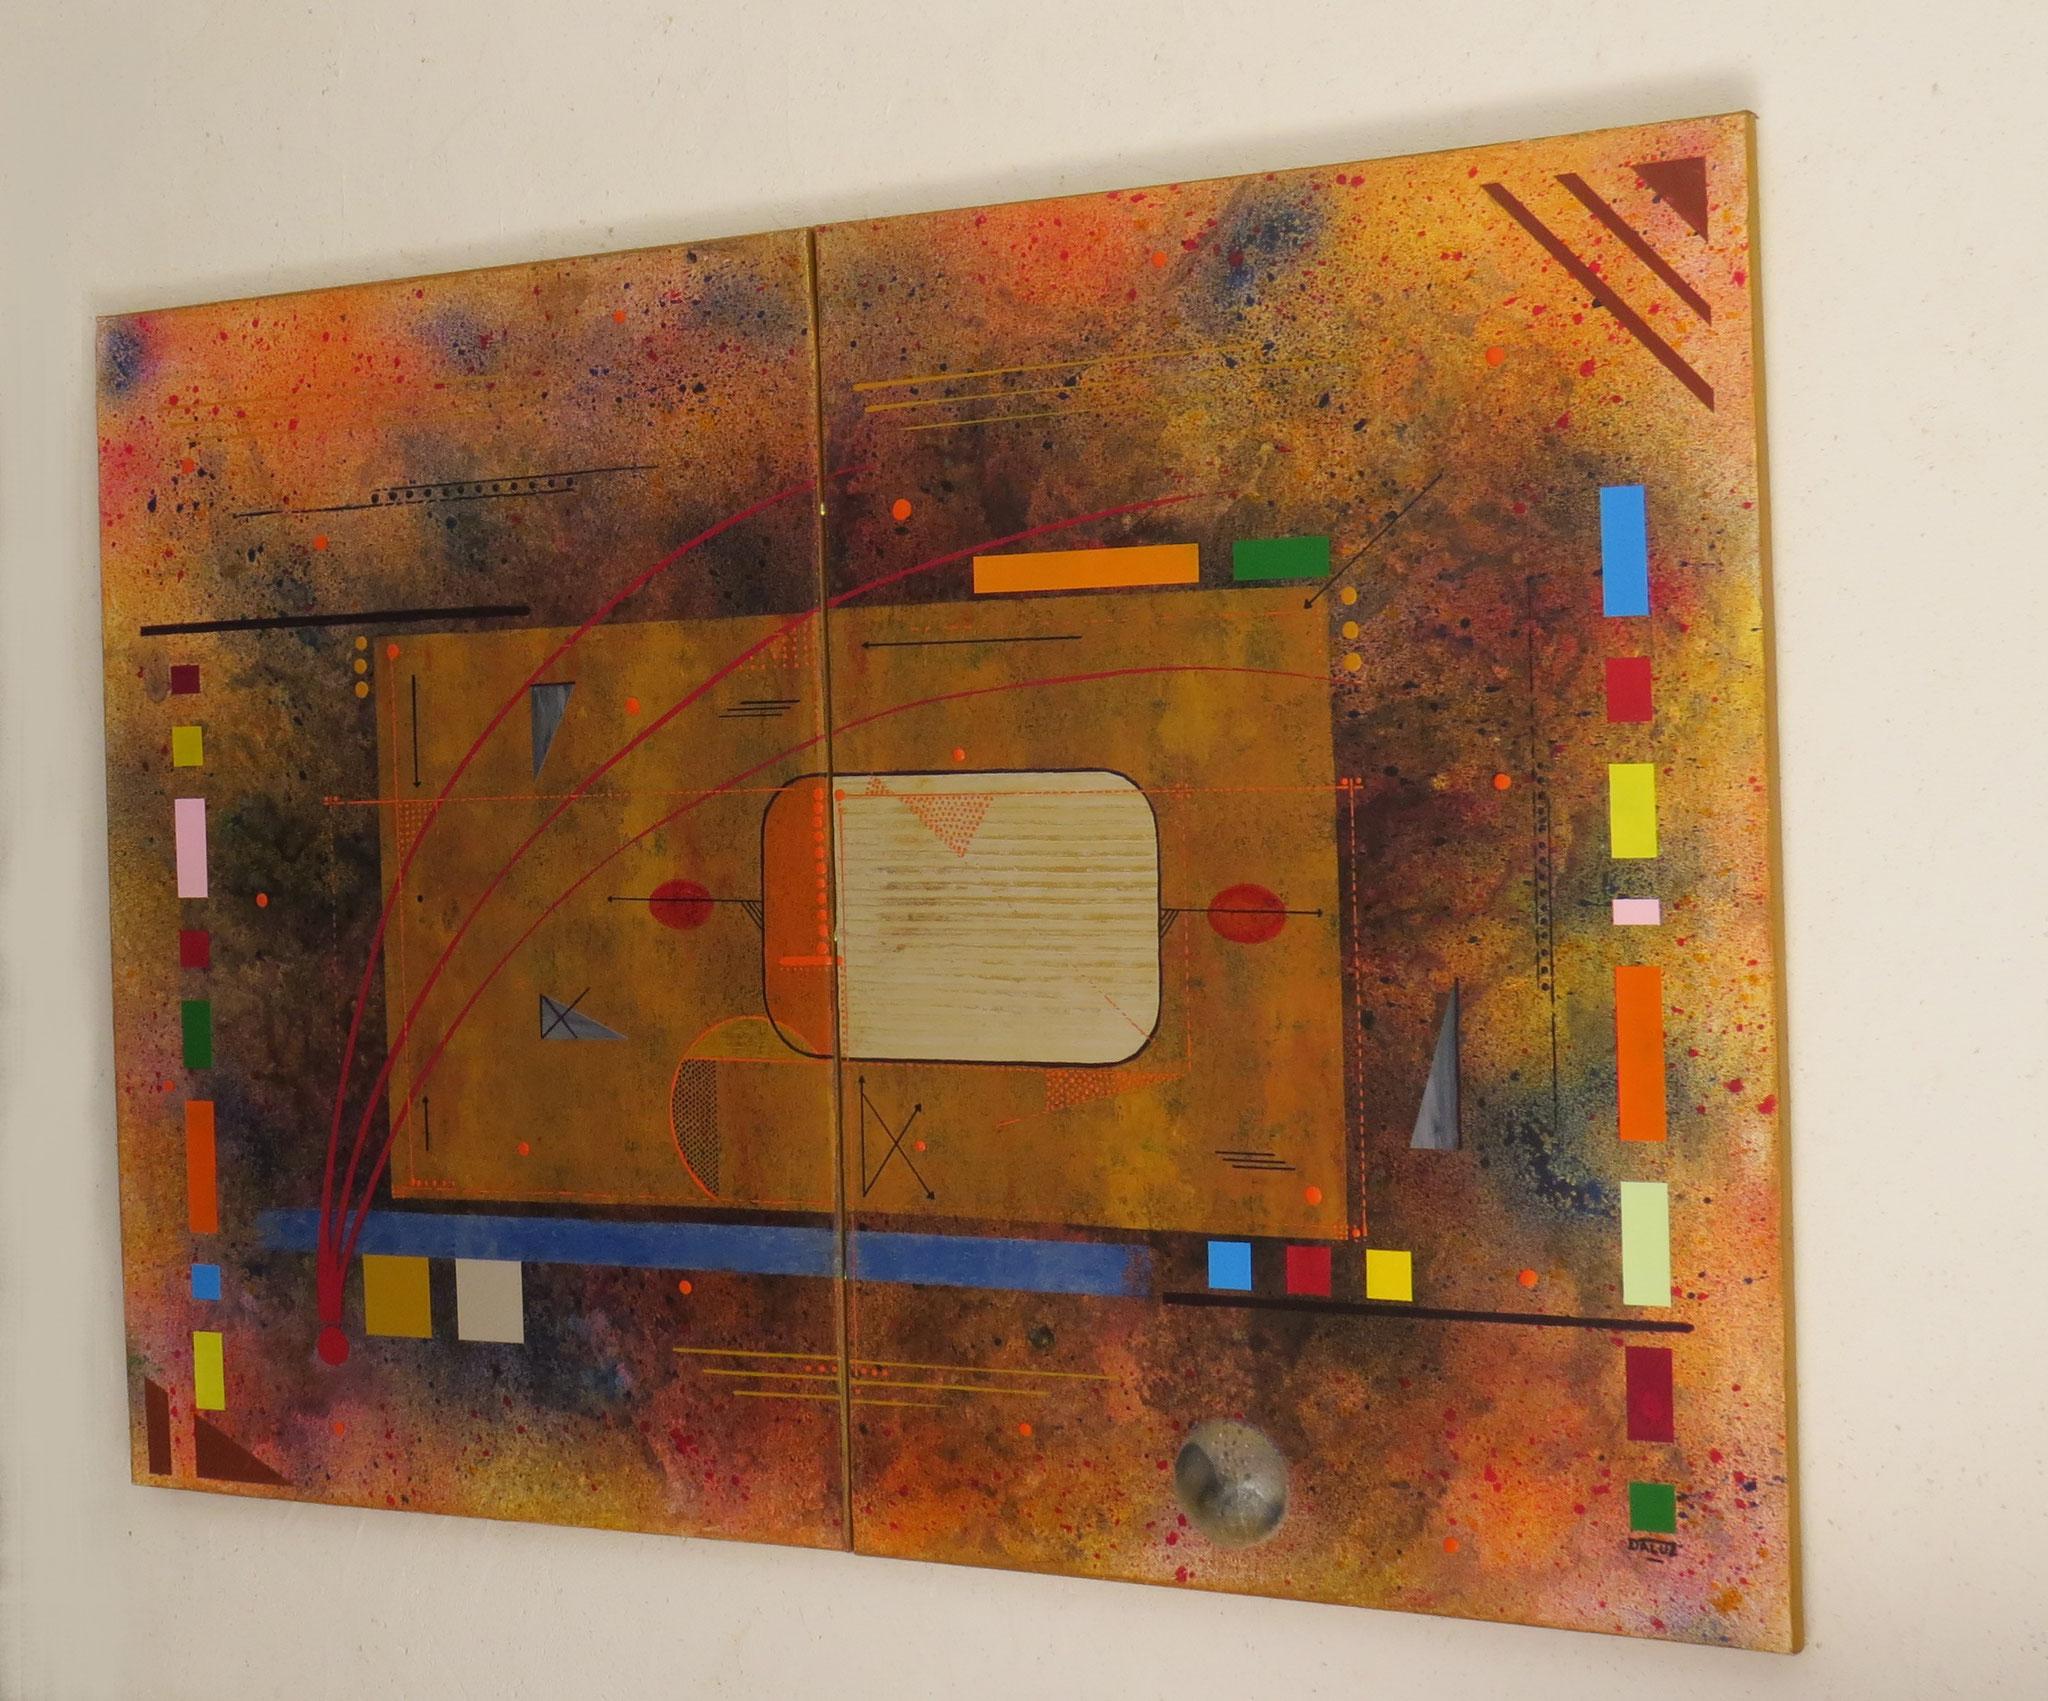 kappa - vue côté2 - DALUZ GALEGO - peinture abstraite